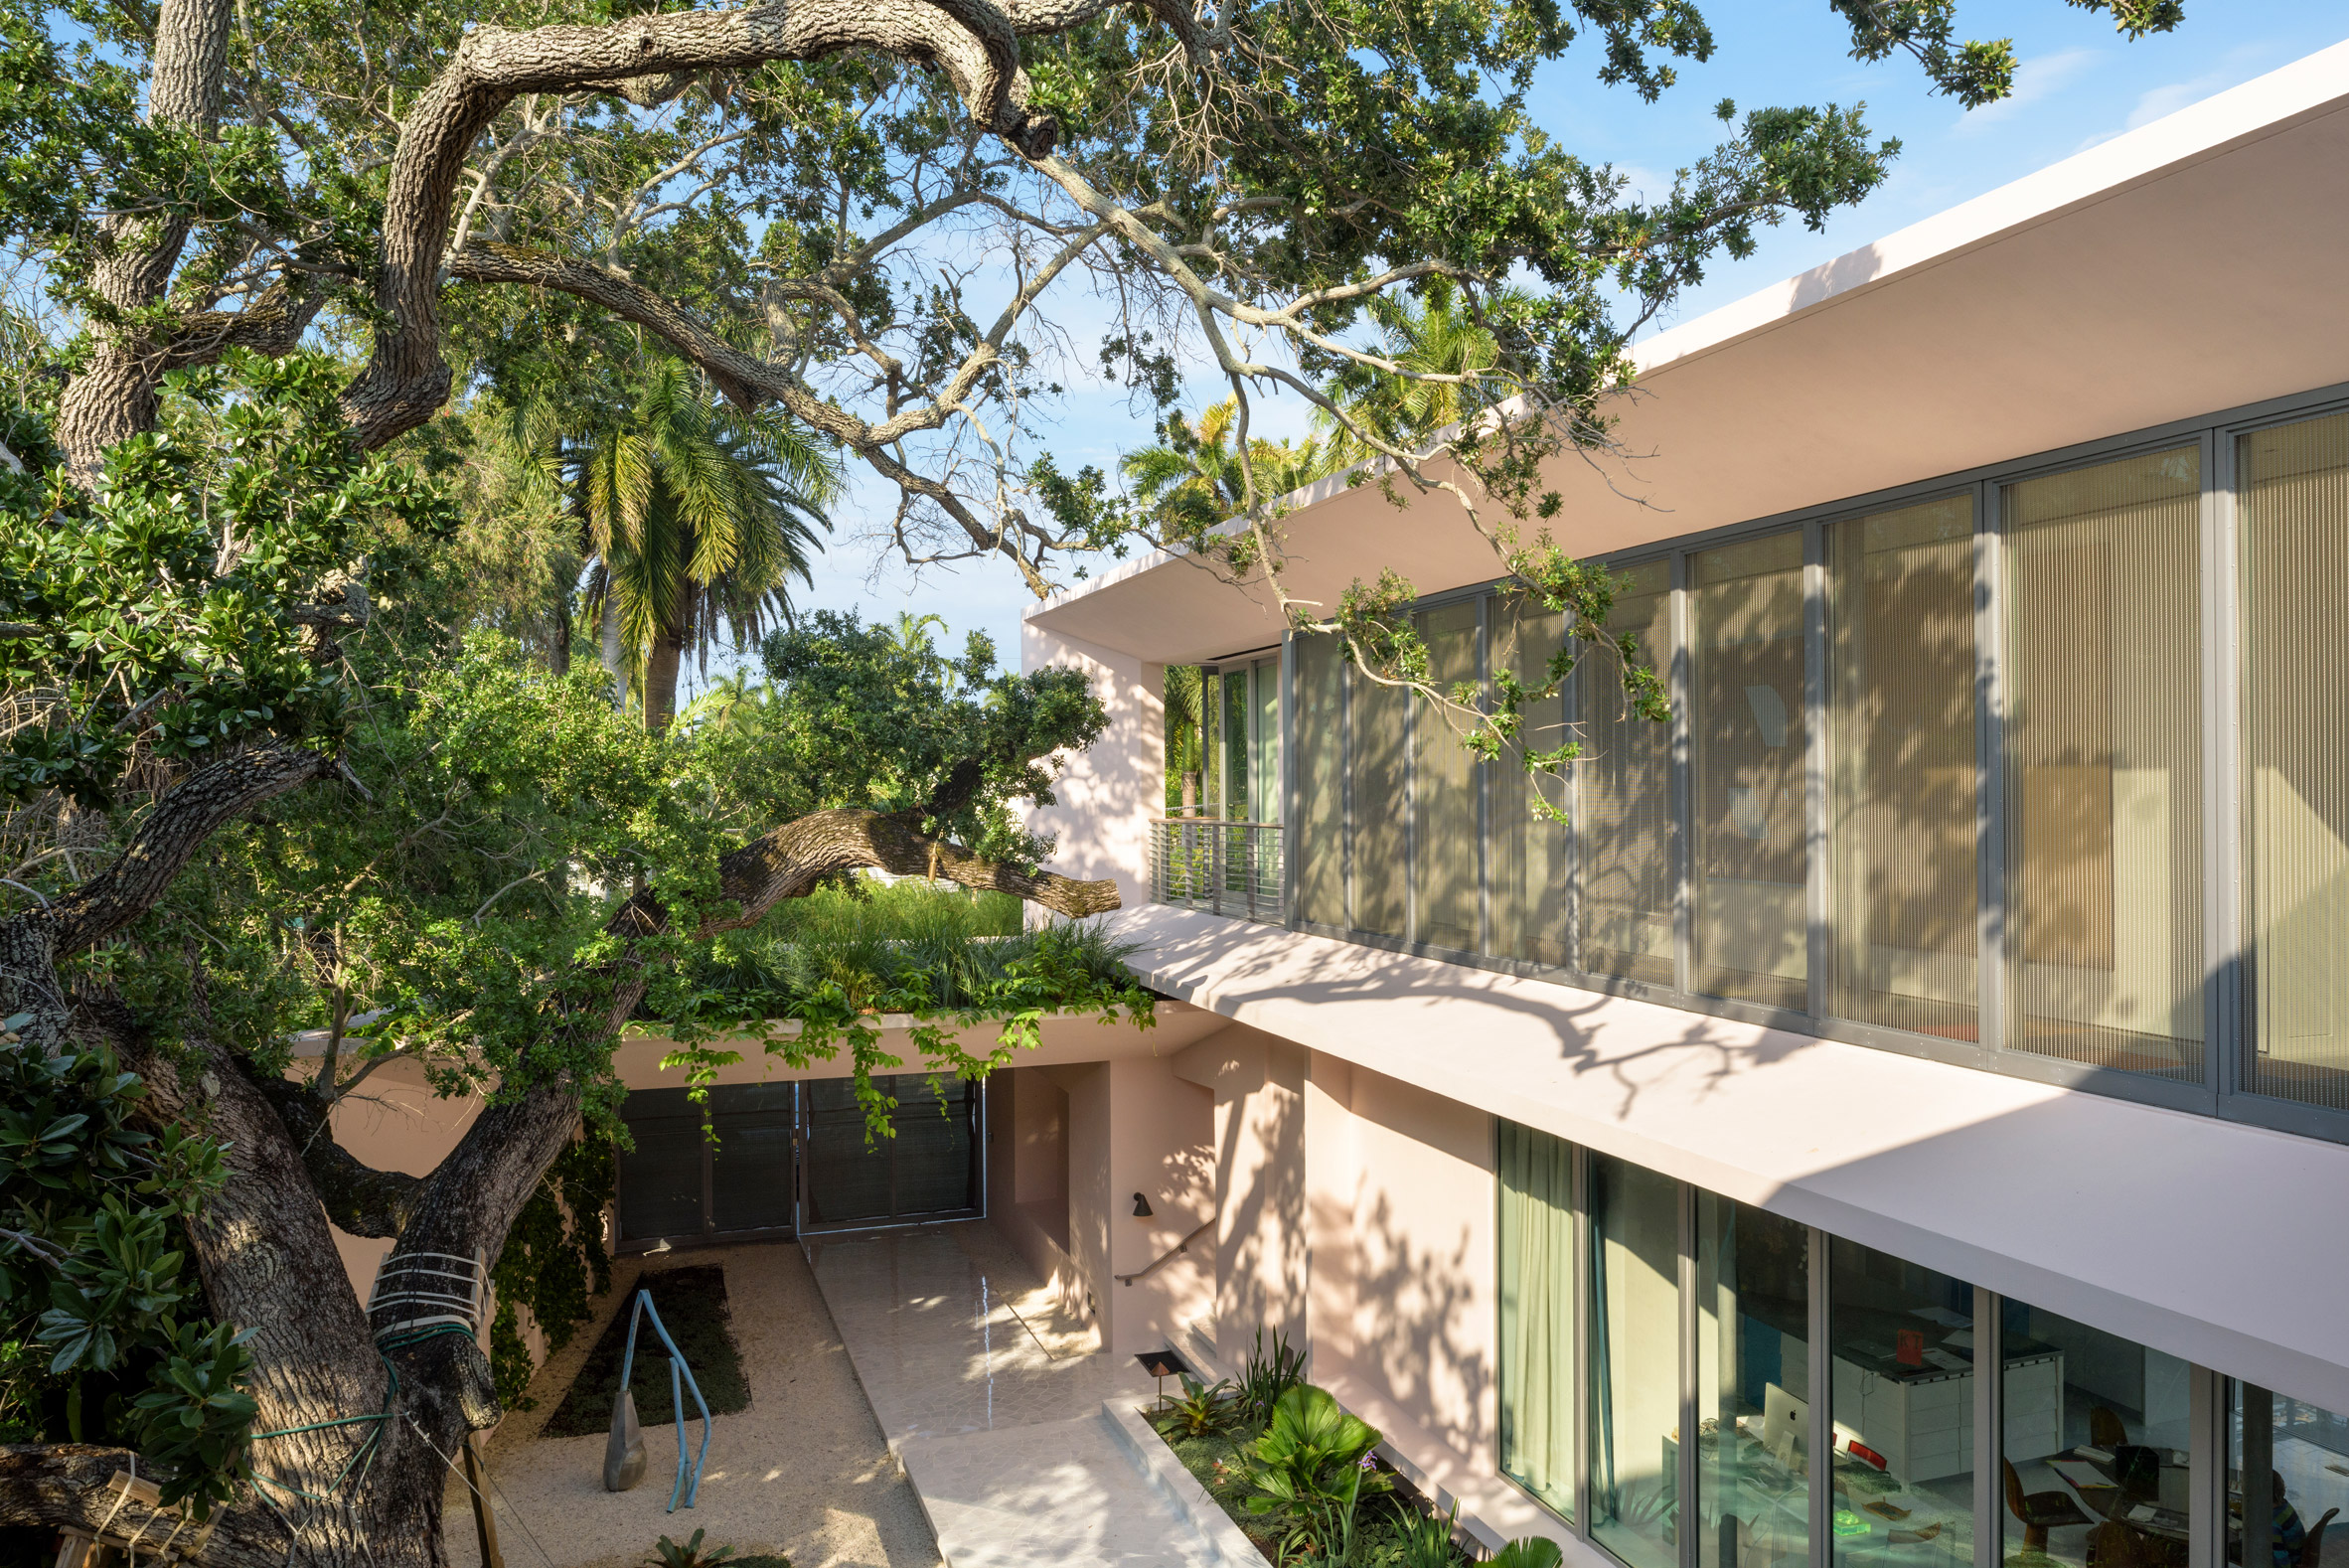 La casa di George Lindemann II firmata Shulman + Associates | Collater.al